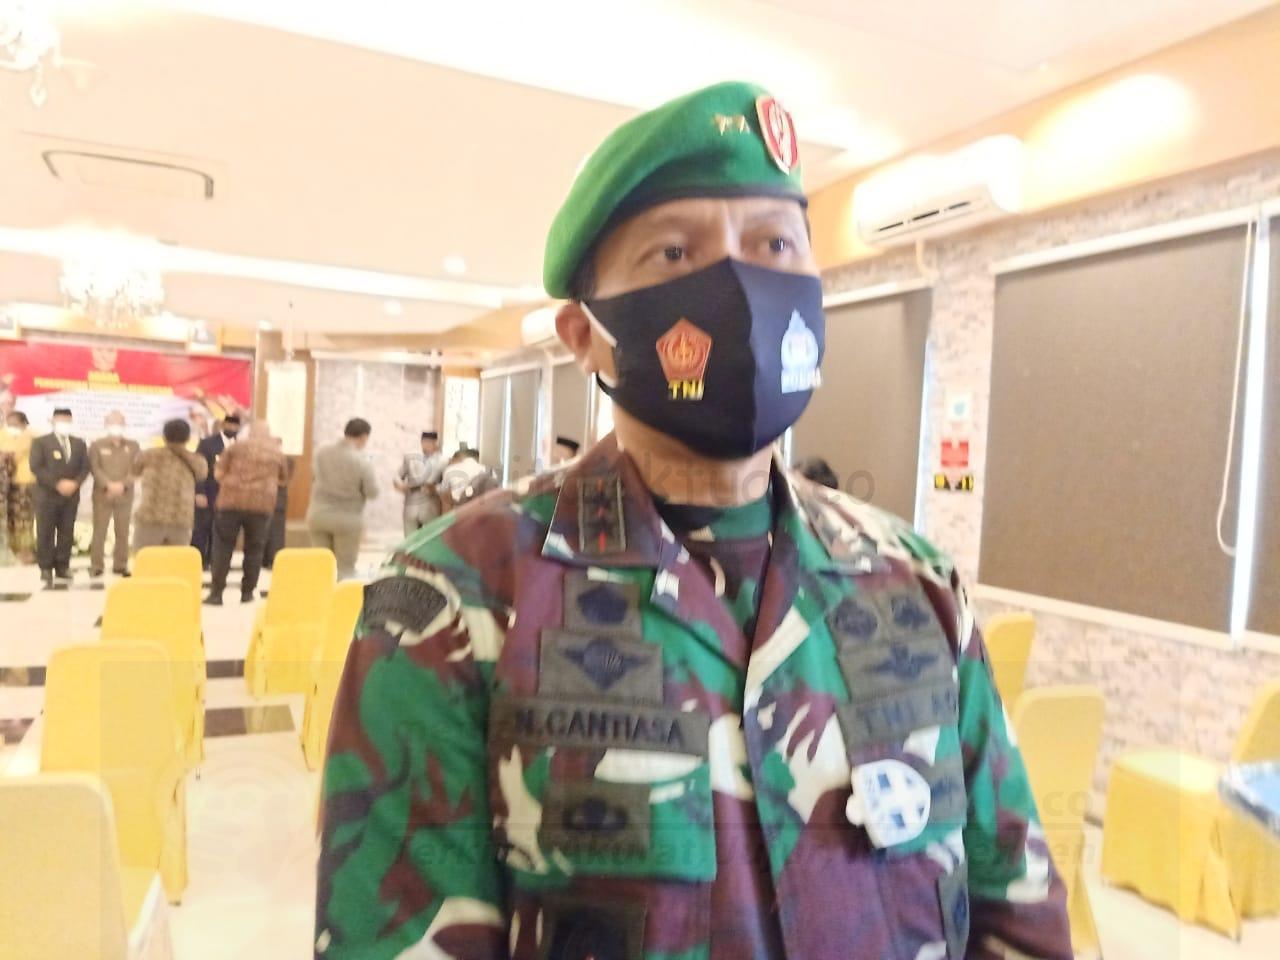 Pangdam XVIII Kasuari: Minggu Besok, 40 Kowad Berangkat Ikut Pendidikan di Bandung 4 IMG 20200926 WA0043